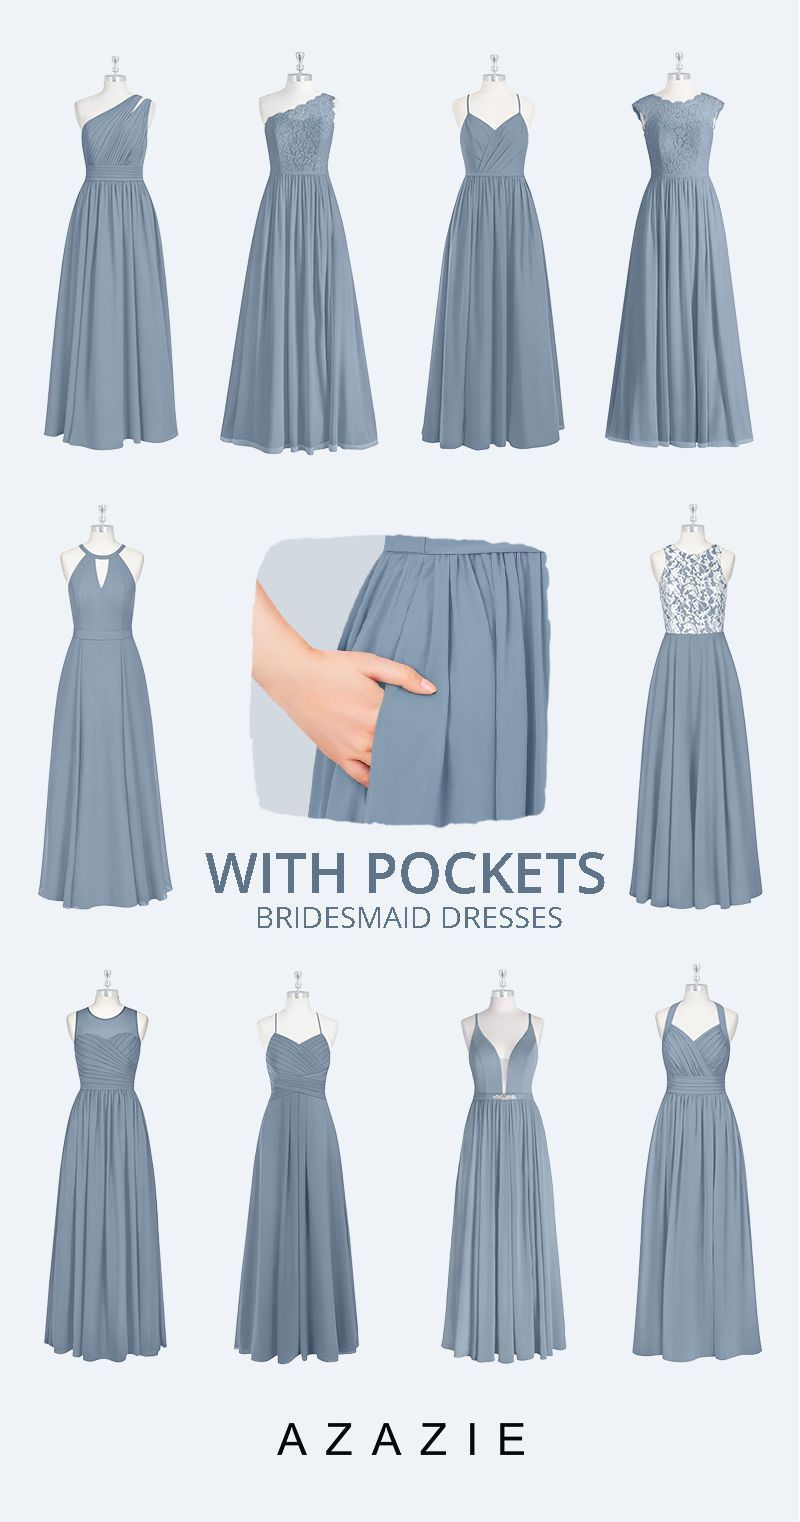 The Gorgeous Wedding Color: Dusty Blue Bridesmaid Dresses